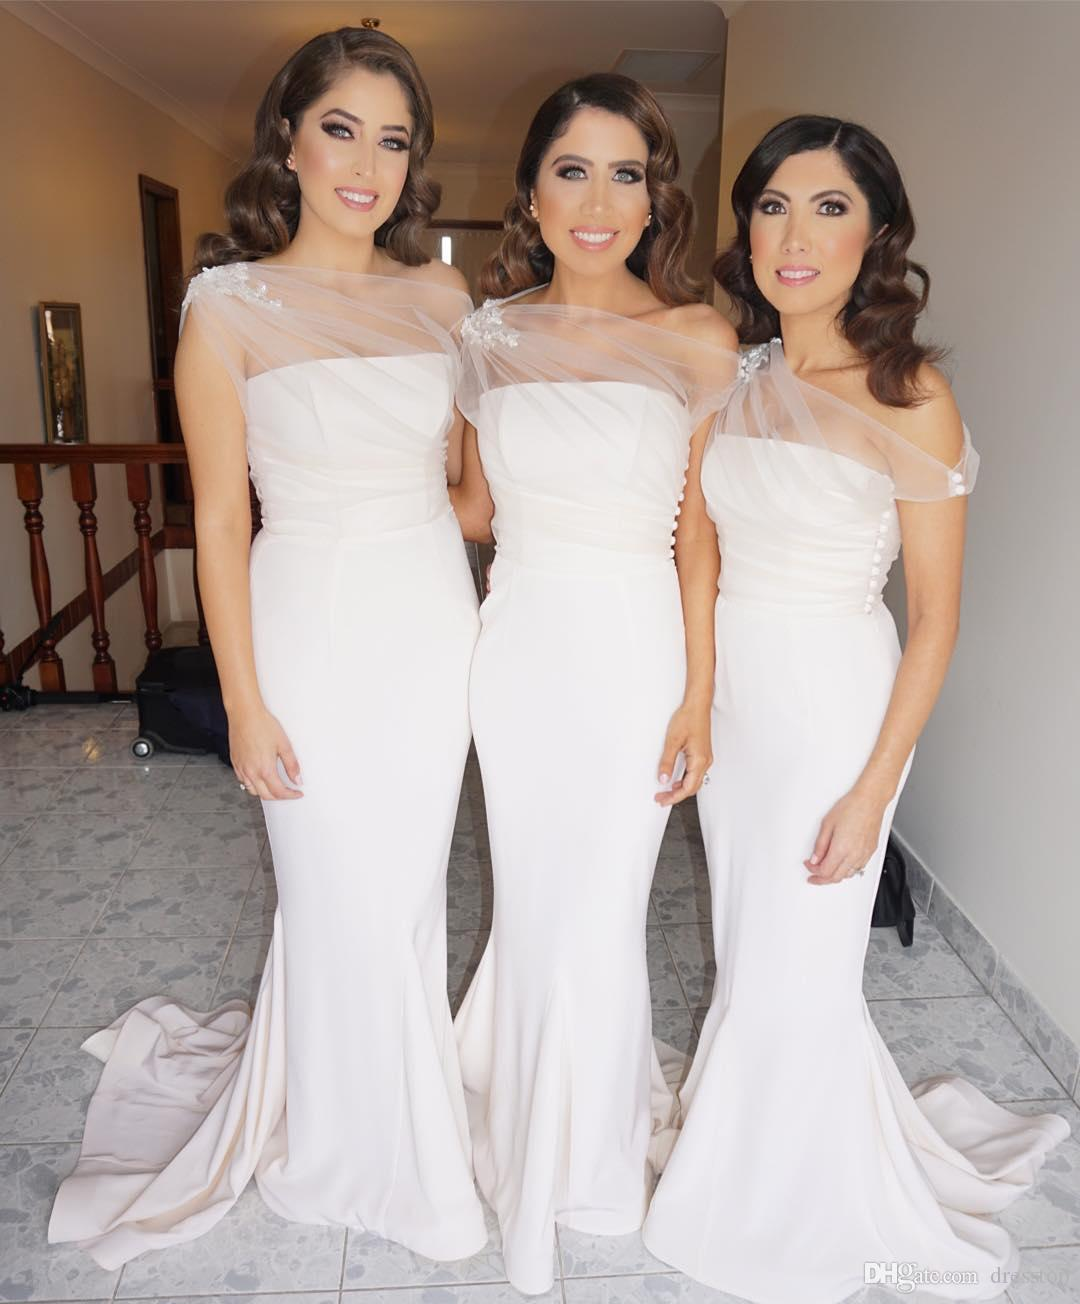 Classy Wedding Guest Dress